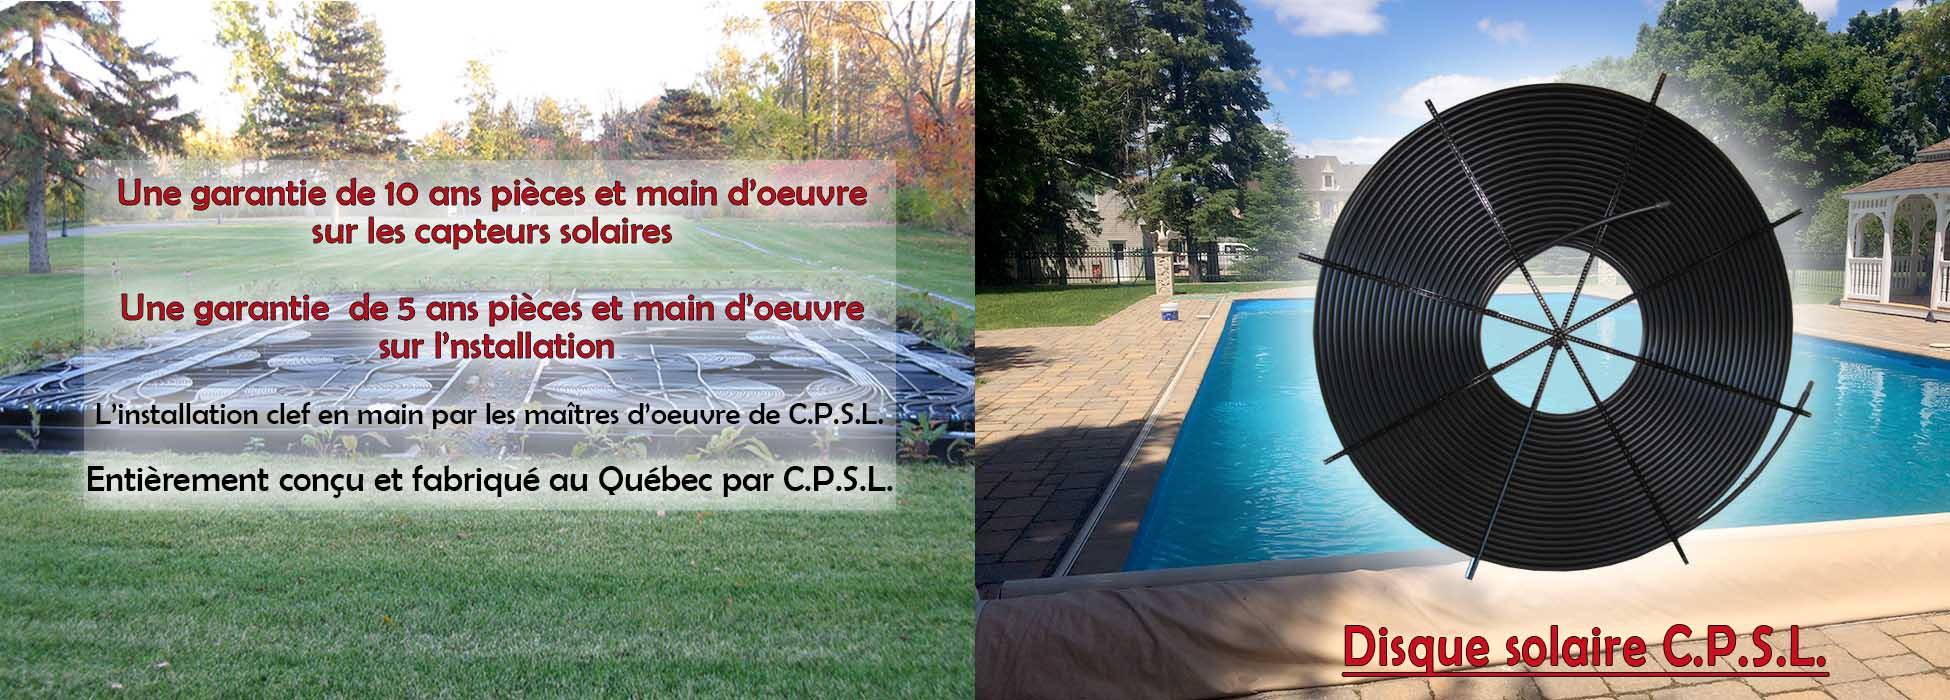 Chauffe piscine solaire laurendeau chauffage capteur for Chauffe piscine solaire club piscine